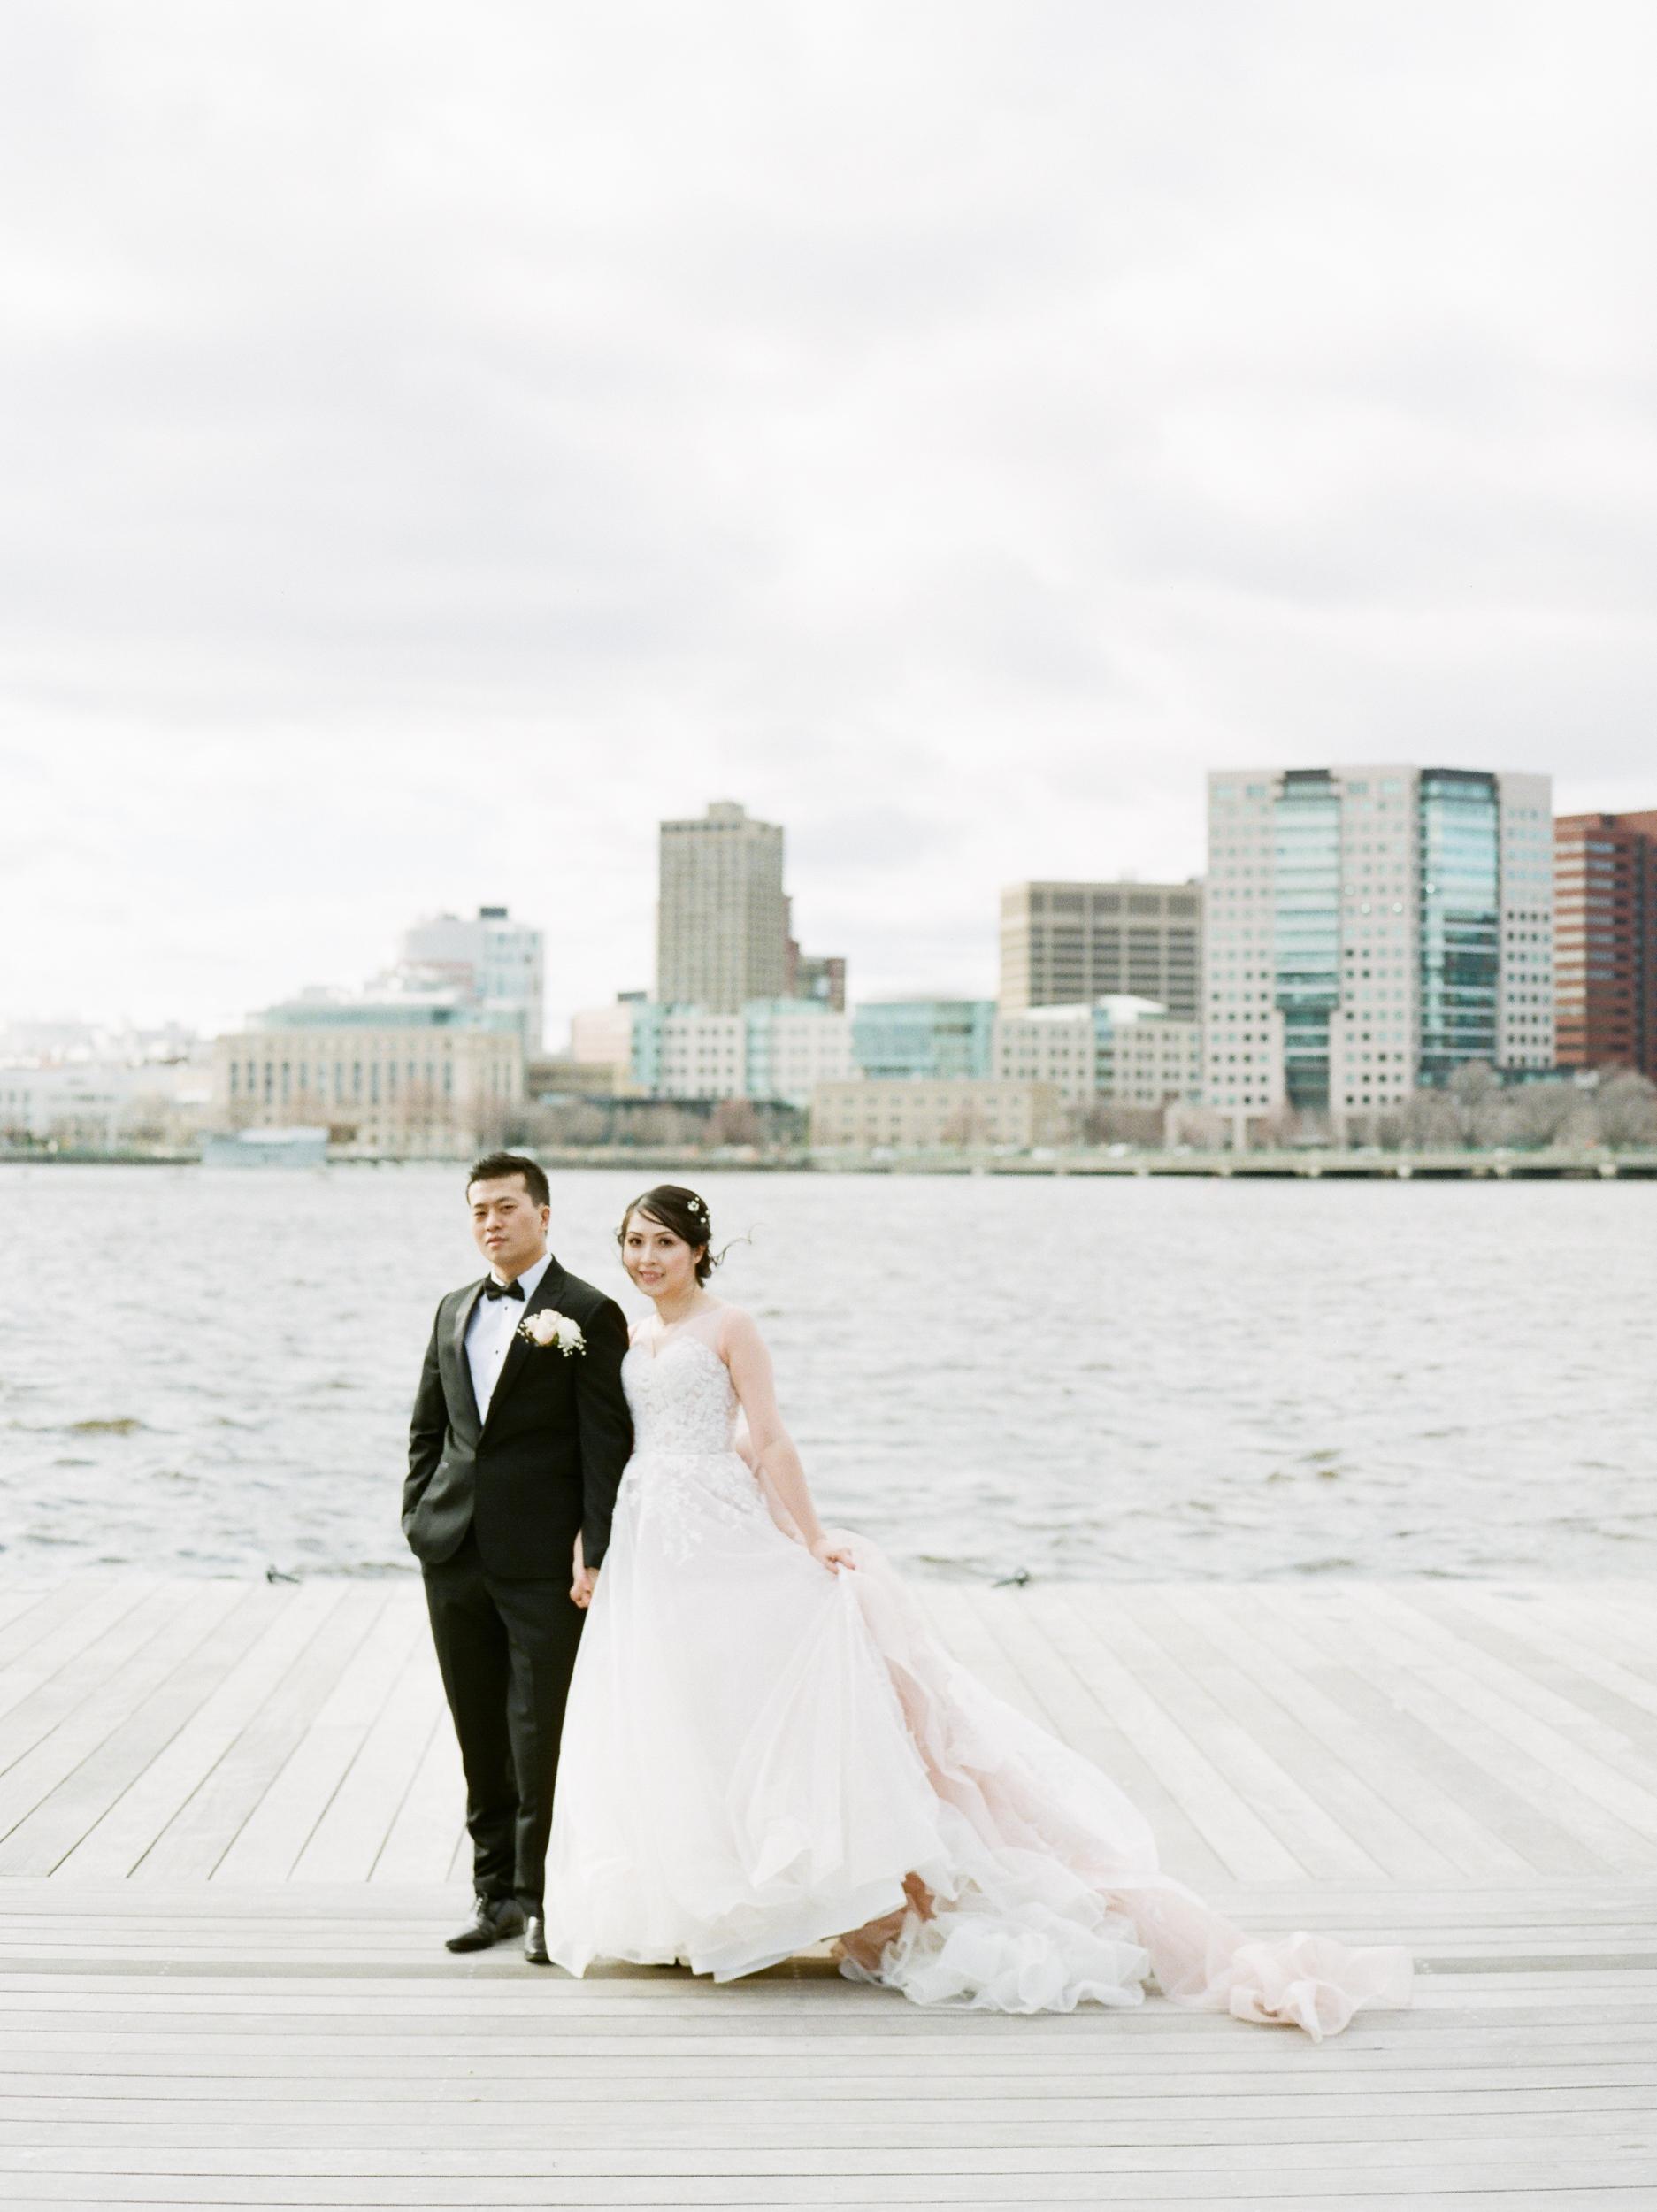 Wedding Photographers in Chatham MA